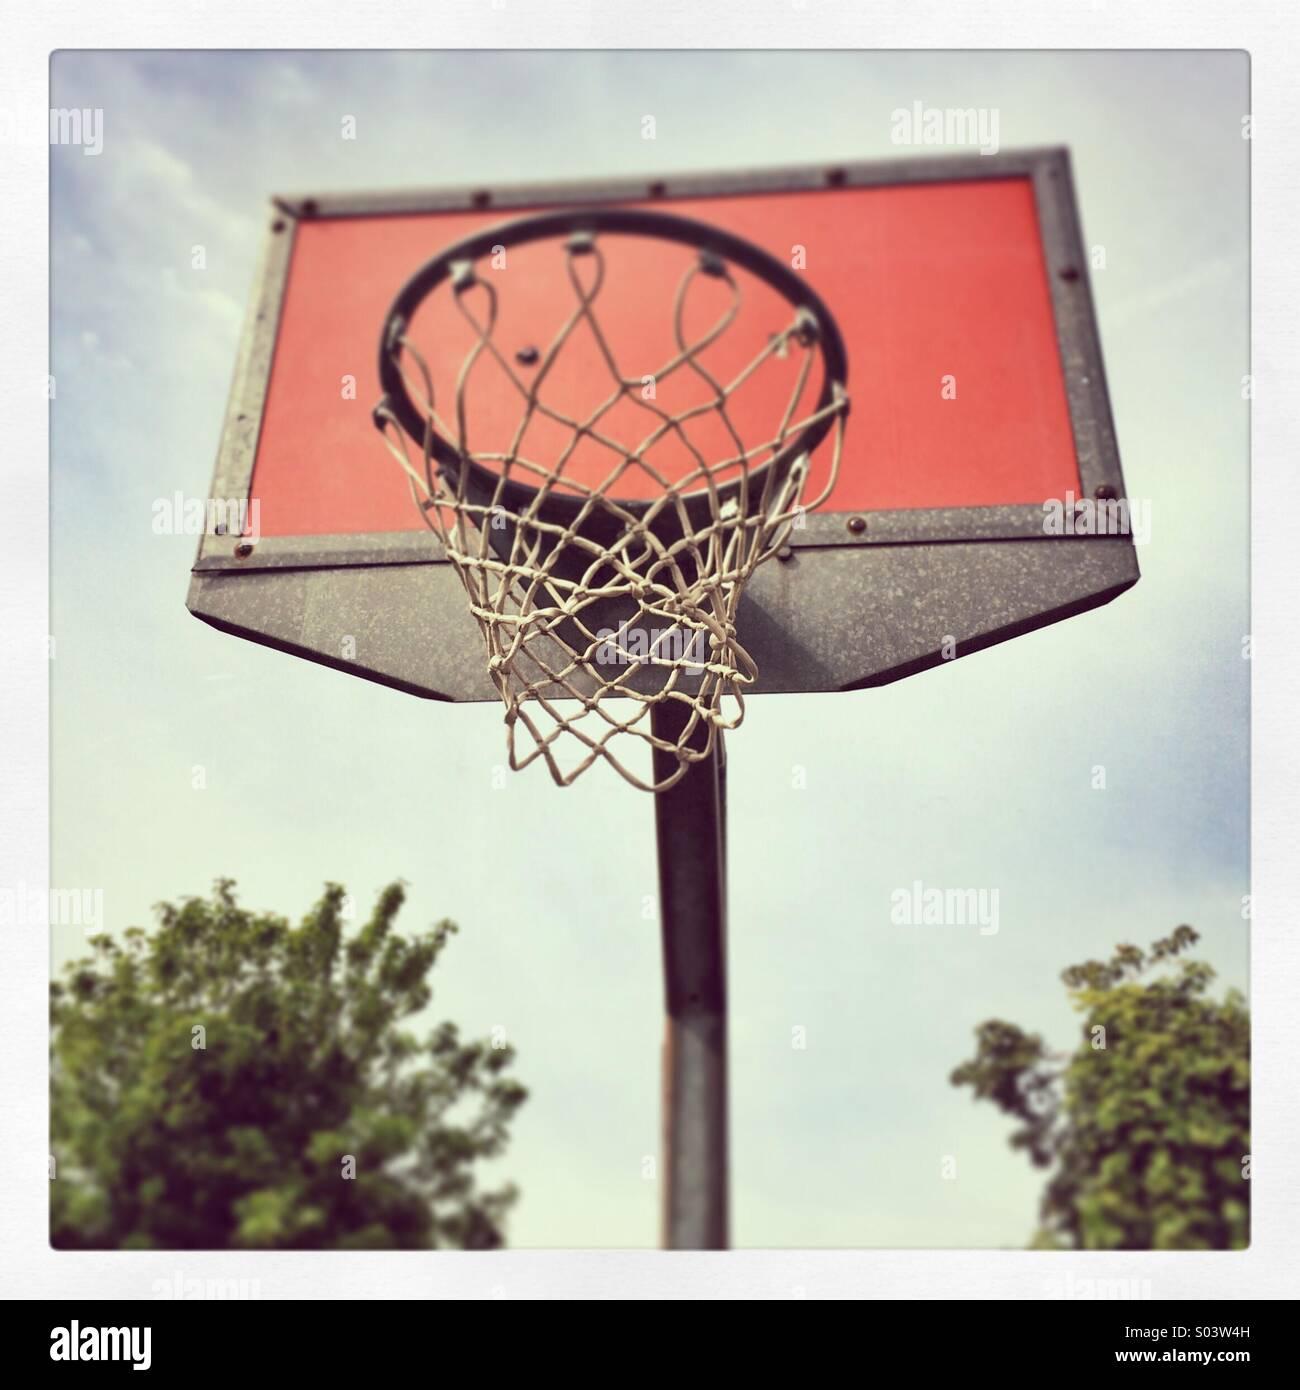 A basketball hoop - Stock Image